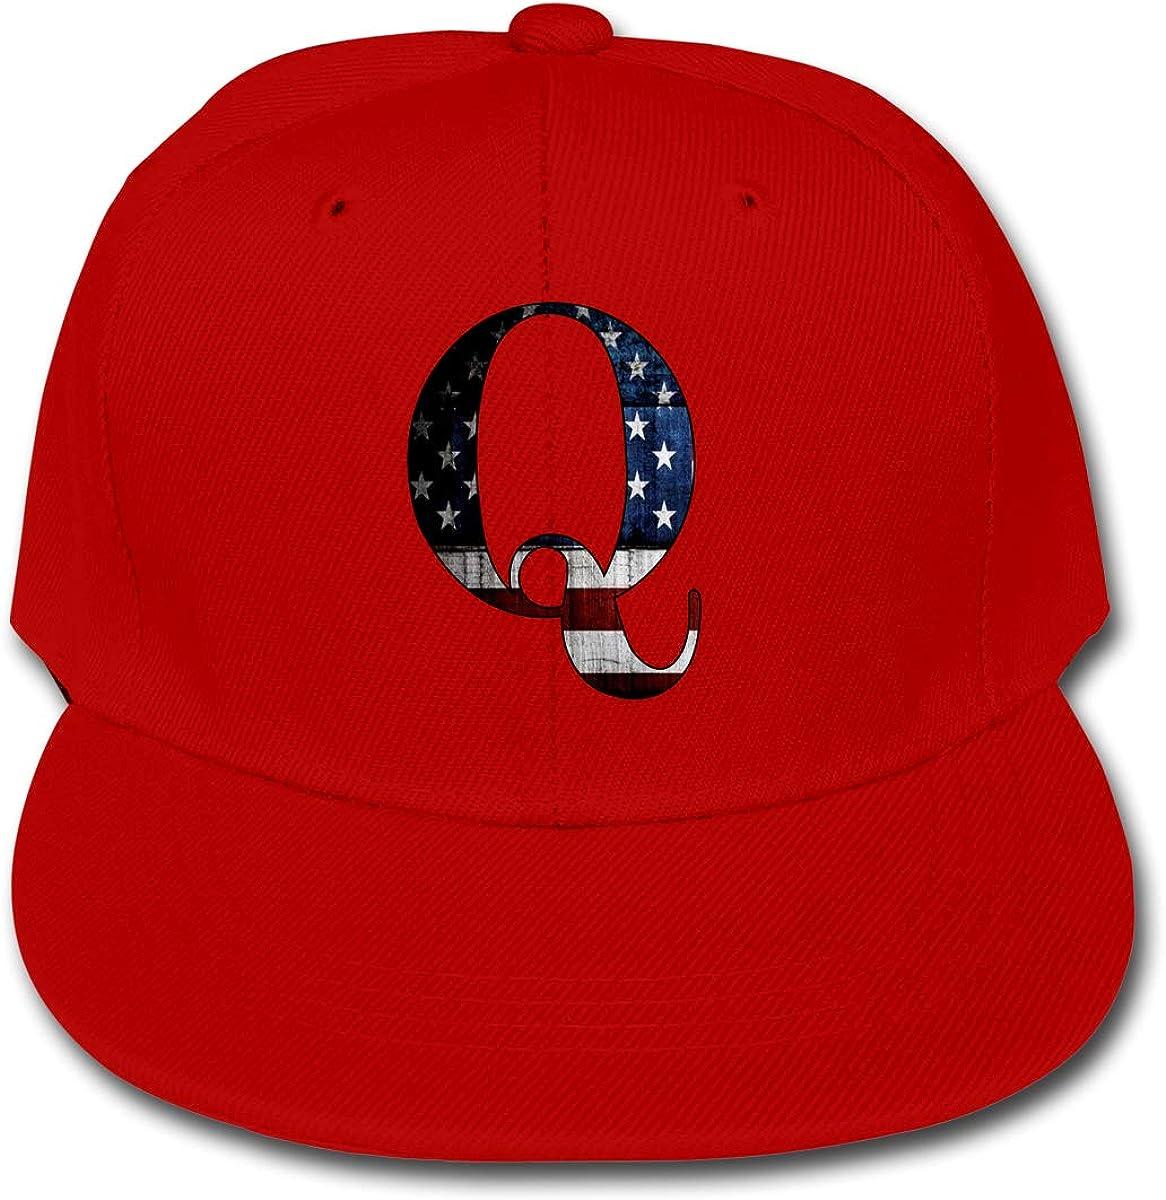 U are Friends Qanon America Adjustable Baseball Cap Hip Hop Hat Boys Girls Kids Sports